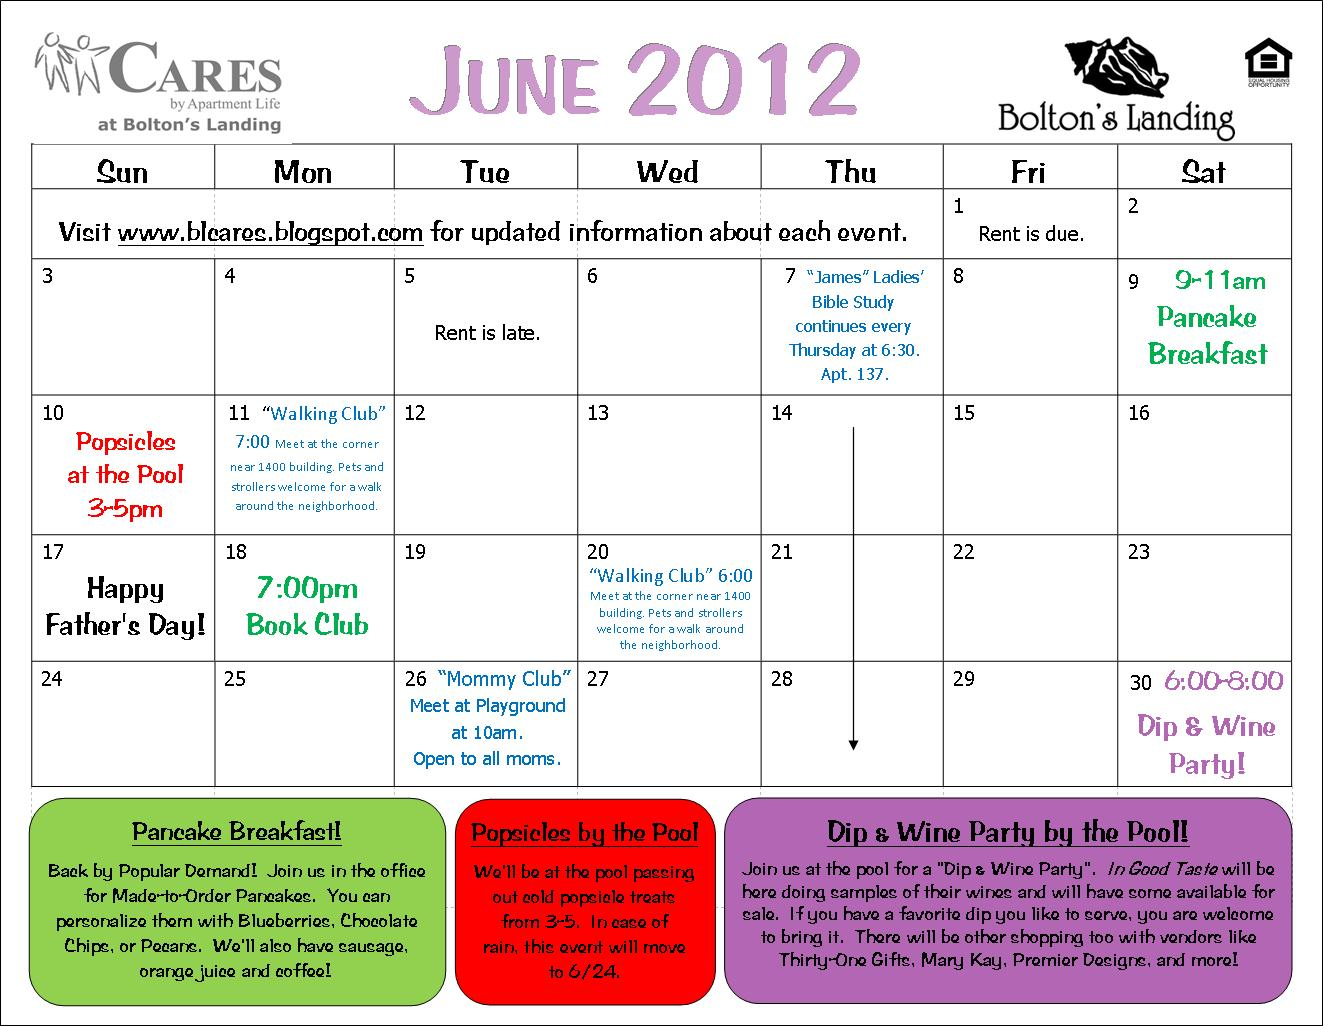 June Calendar Events : Bolton s landing cares